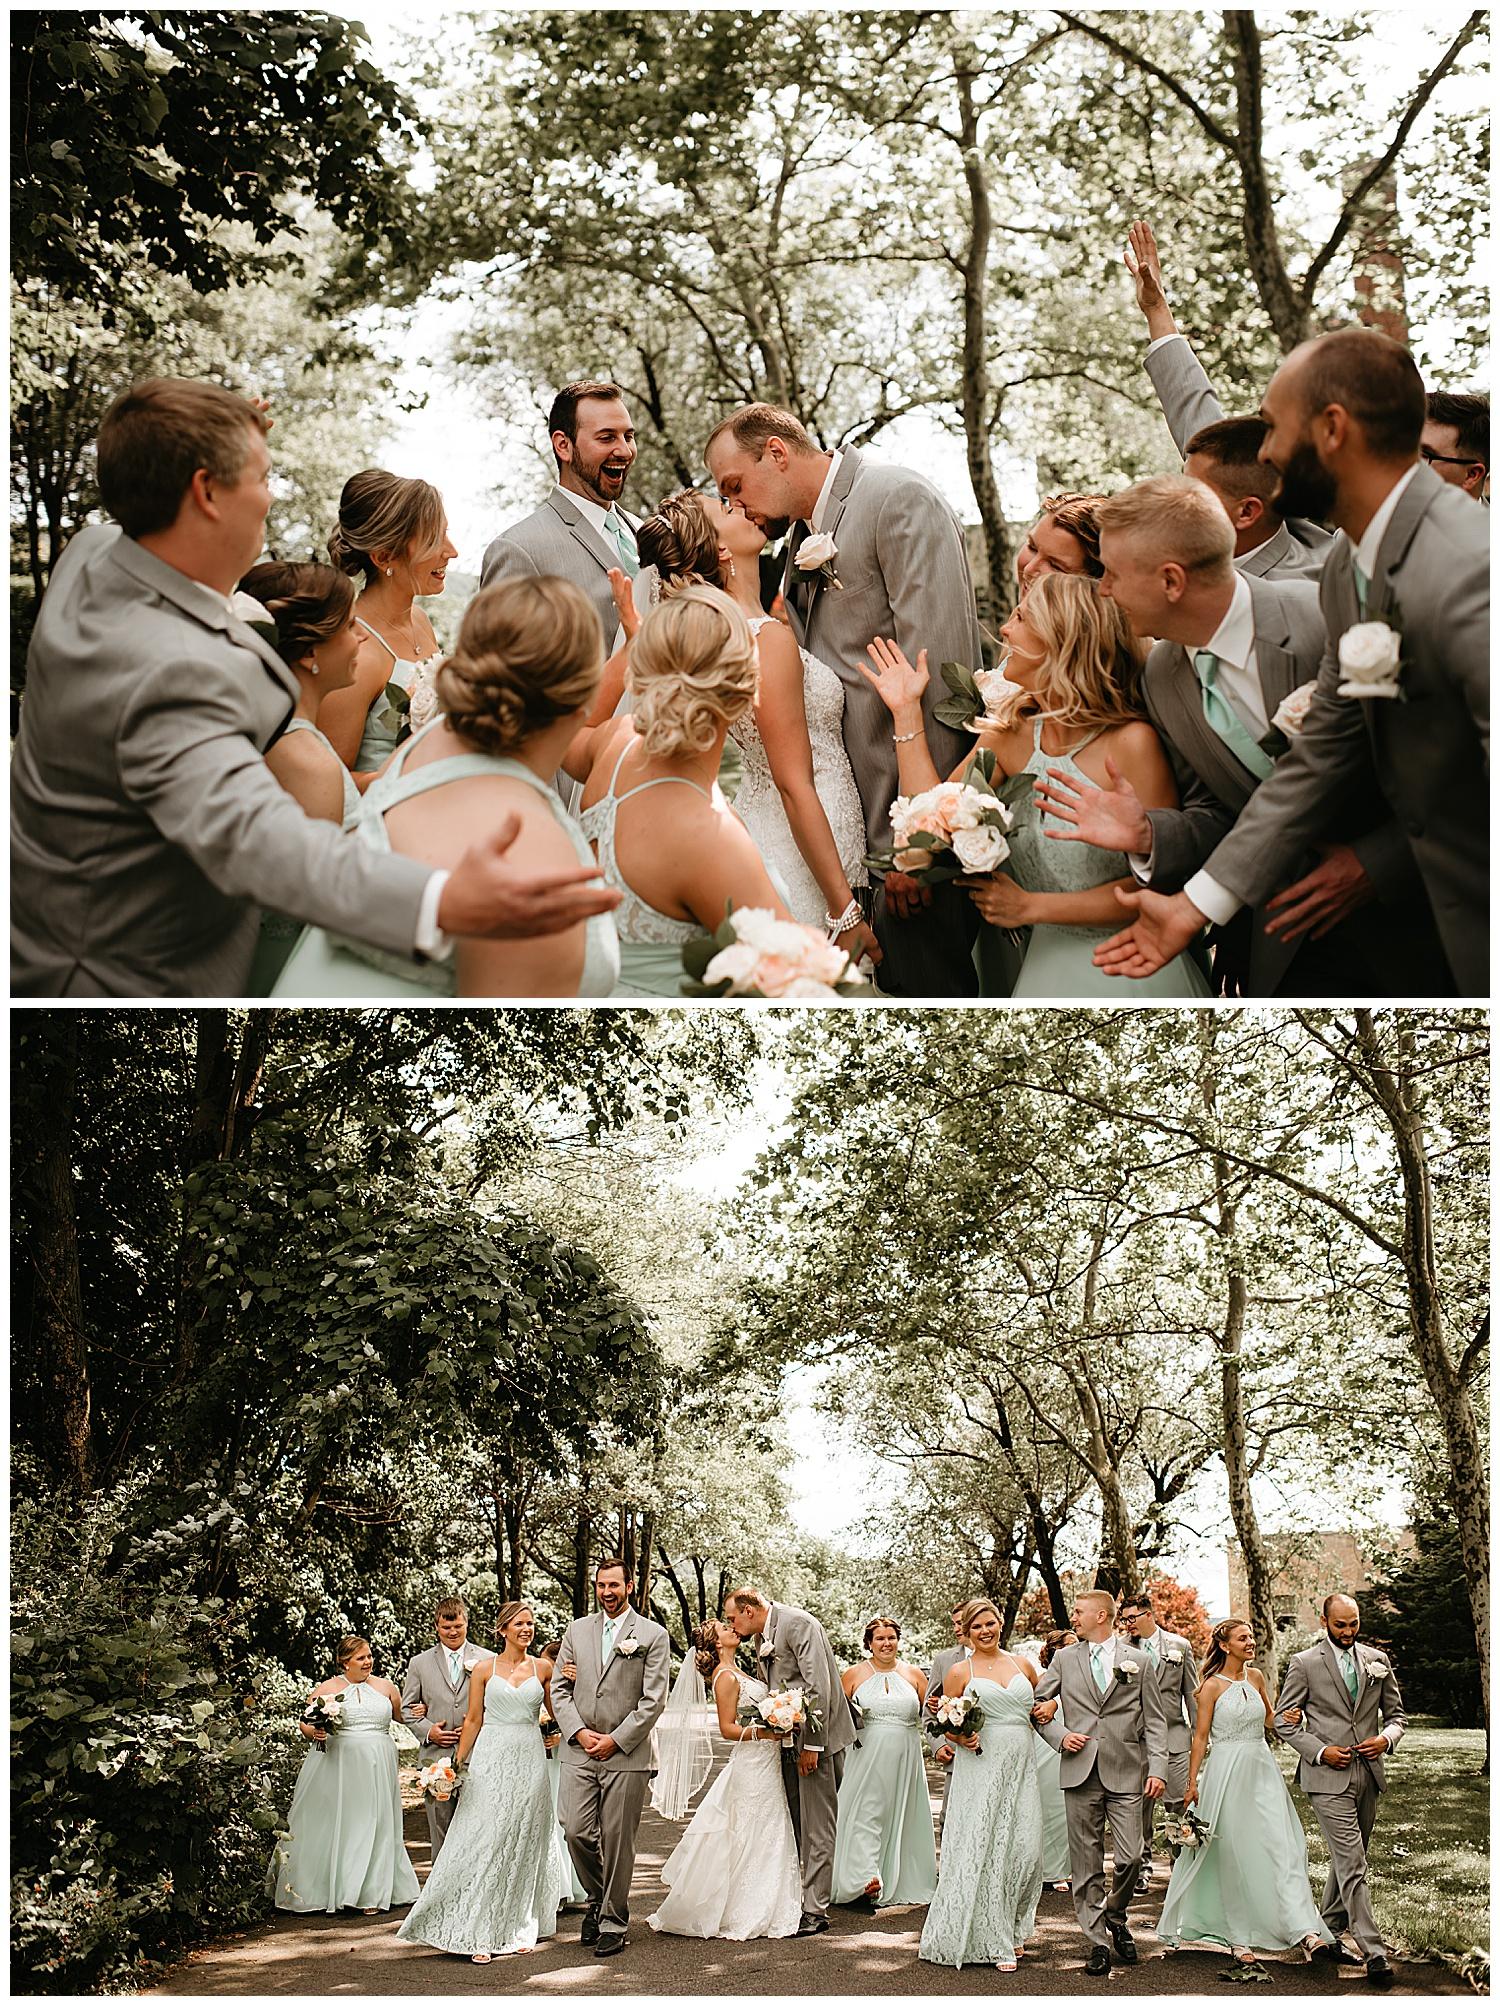 NEPA-Lehigh-Valley-Wedding-Photographer-at-Fountain-Springs-Country-Inn-Ashland-PA_0033.jpg